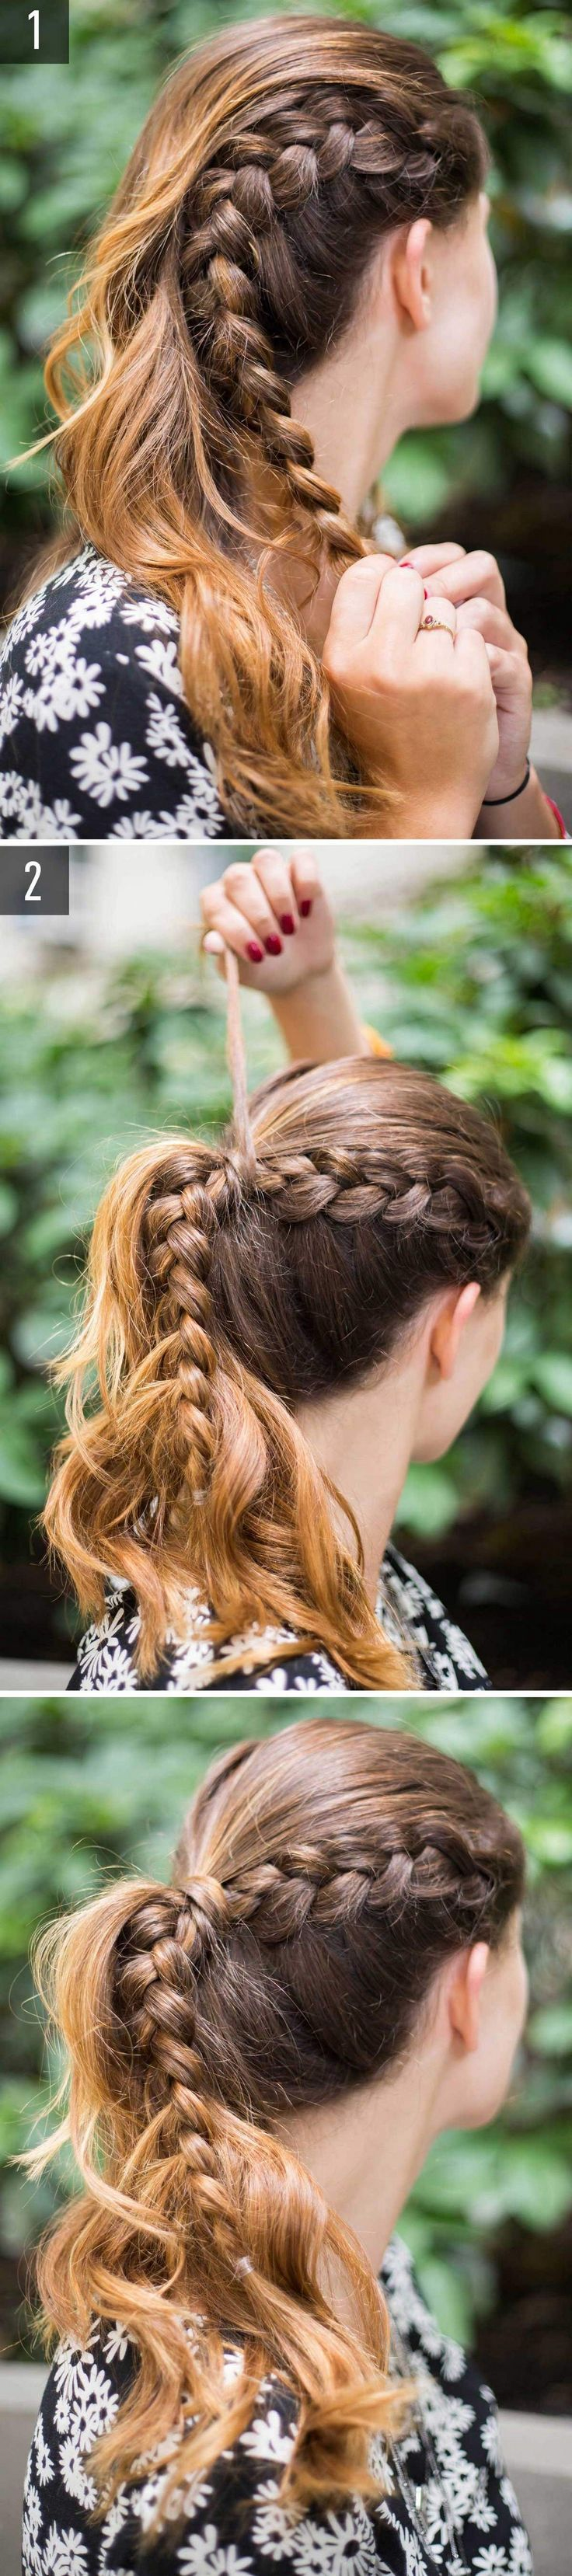 cute easy summer hairstyles for long hair easy summer